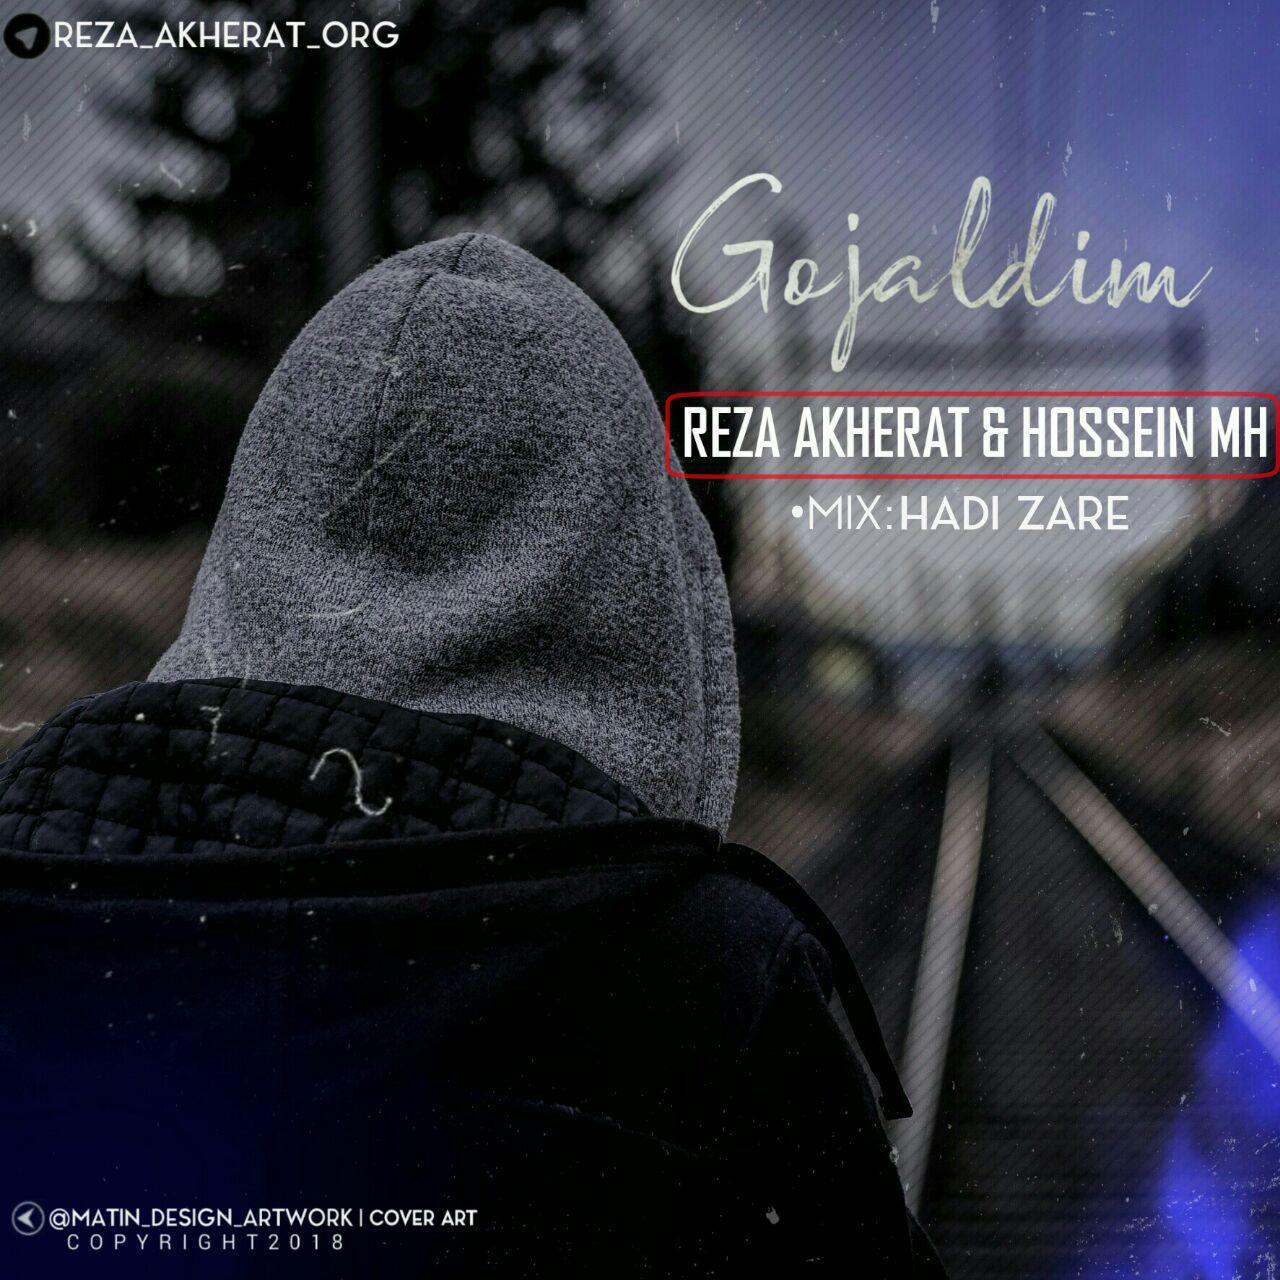 http://s9.picofile.com/file/8355219892/18Reza_Akherat_Hossein_MH_Ghojaldim.jpg